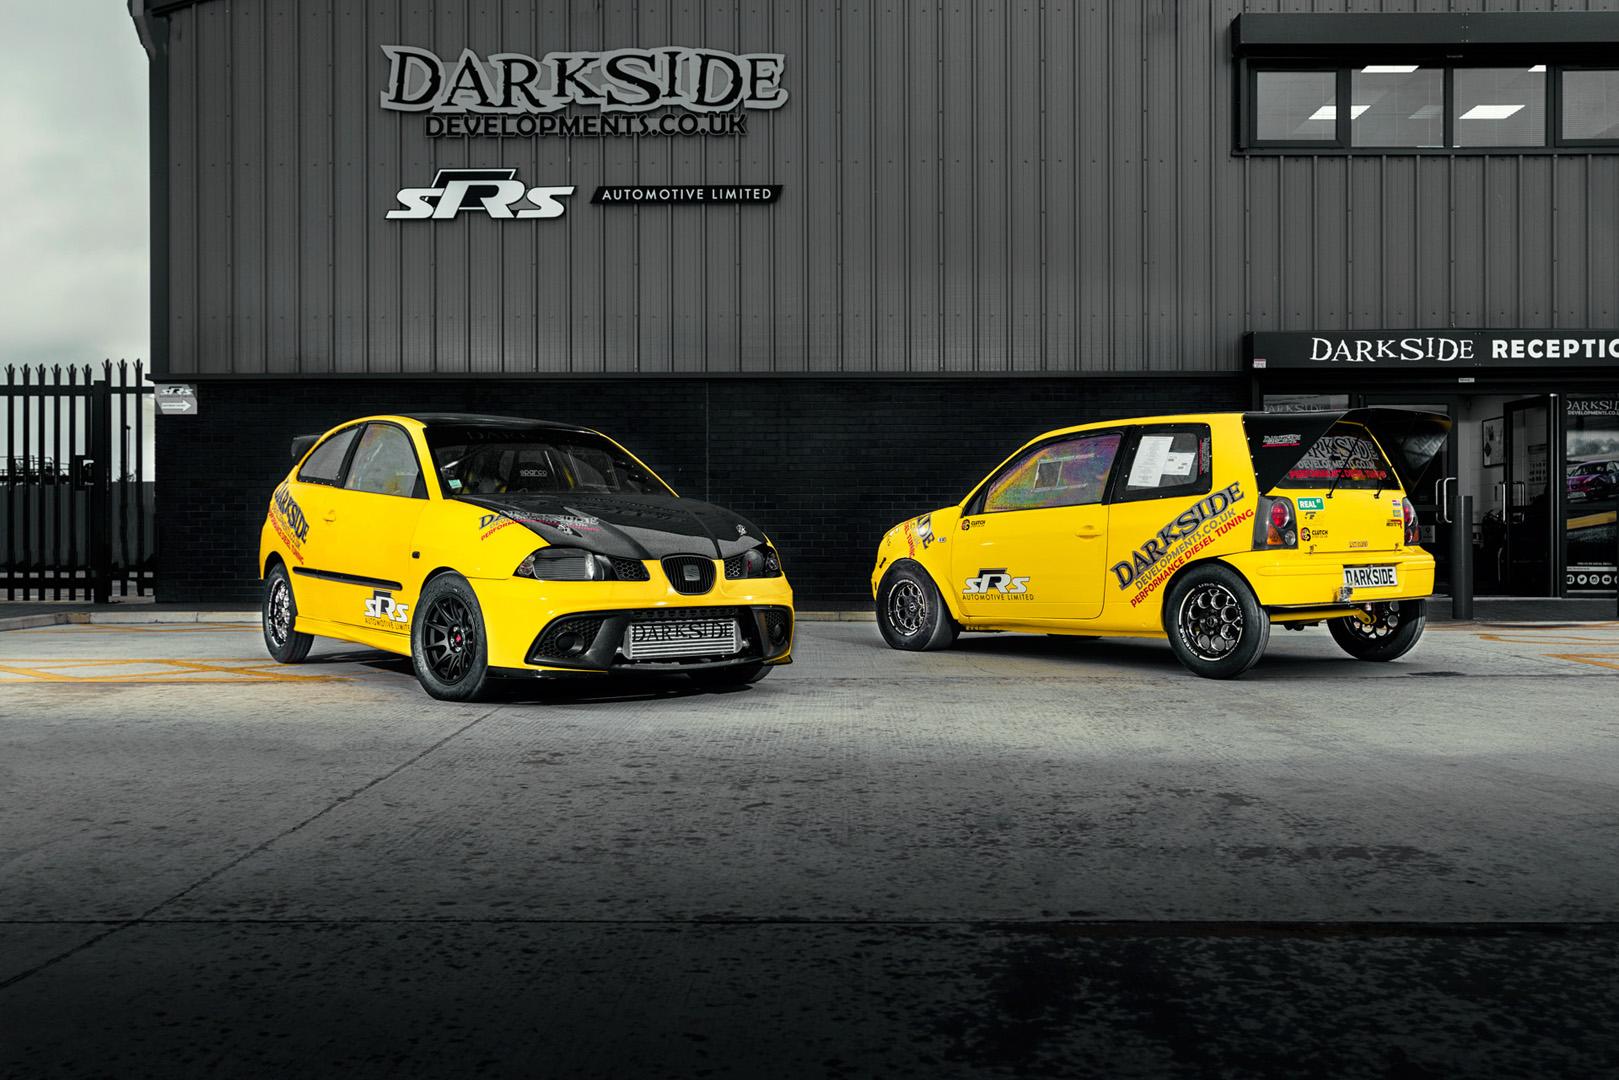 Darkside Developments 6